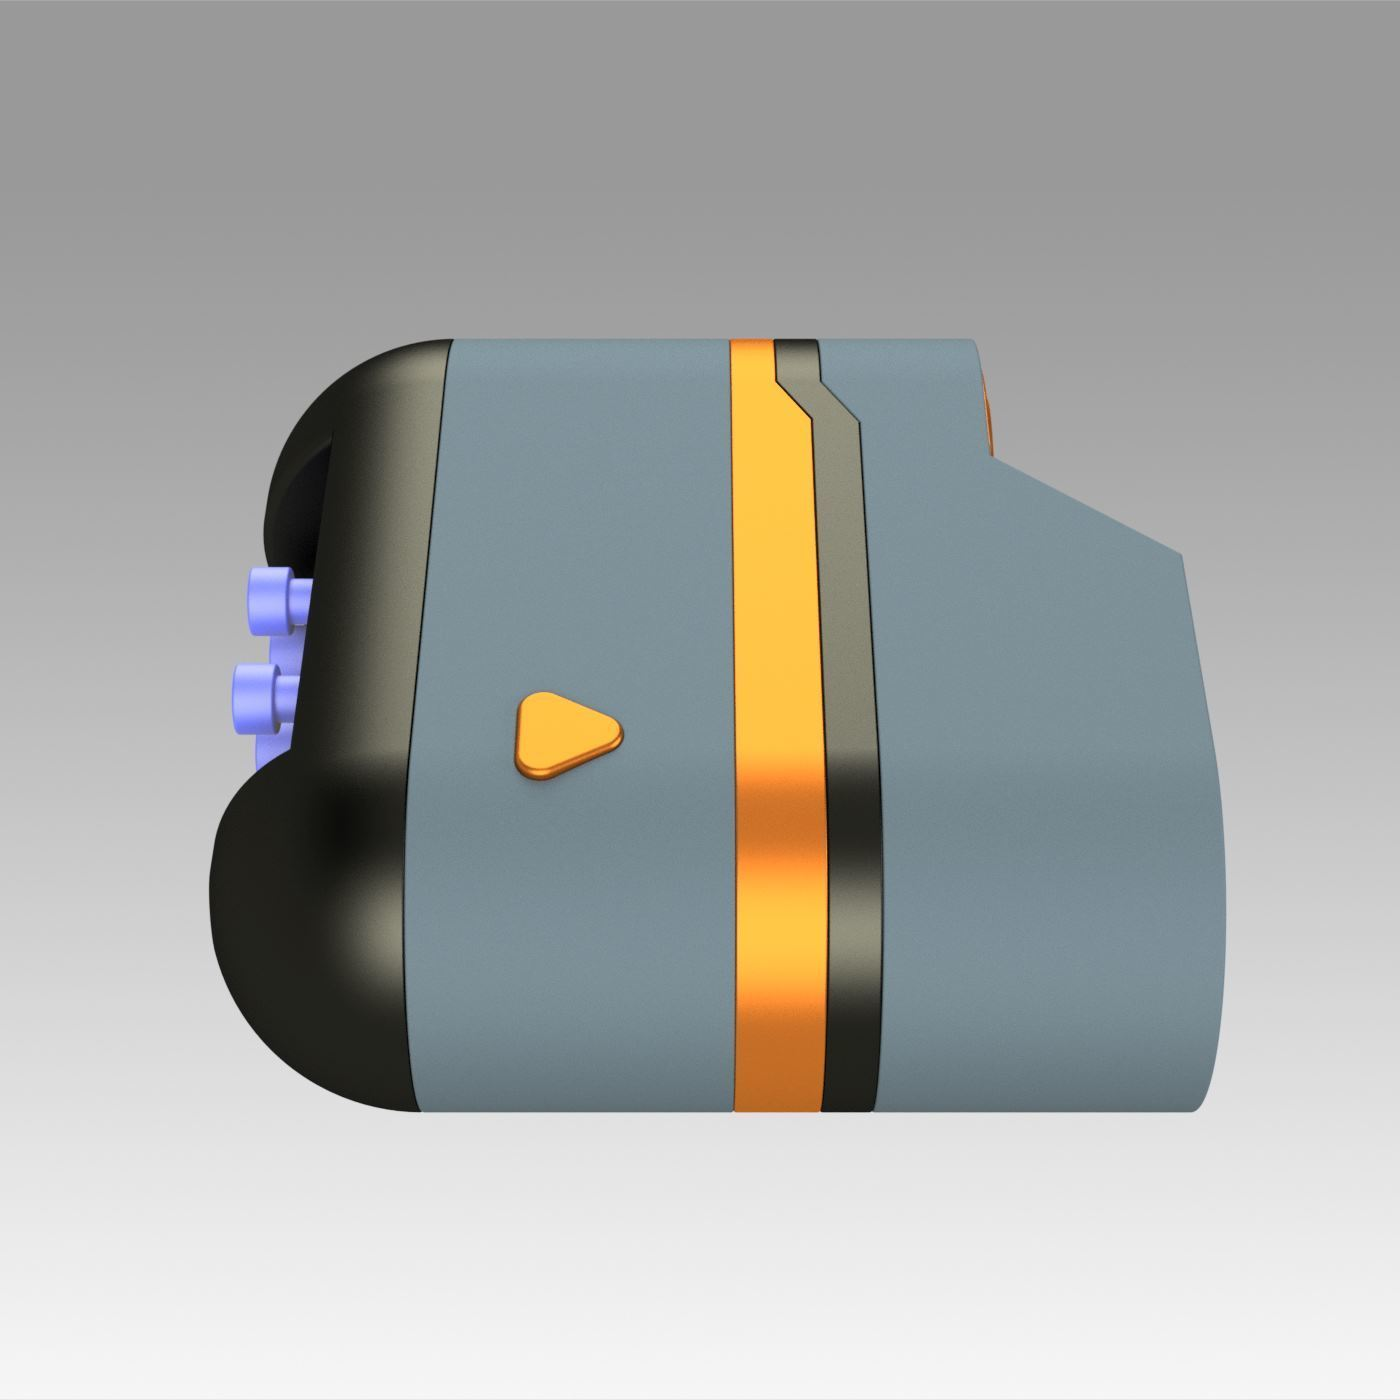 7.jpg Download OBJ file Star Trek Prop Dr Phlox Scanner replica prop cosplay • 3D printer object, Blackeveryday